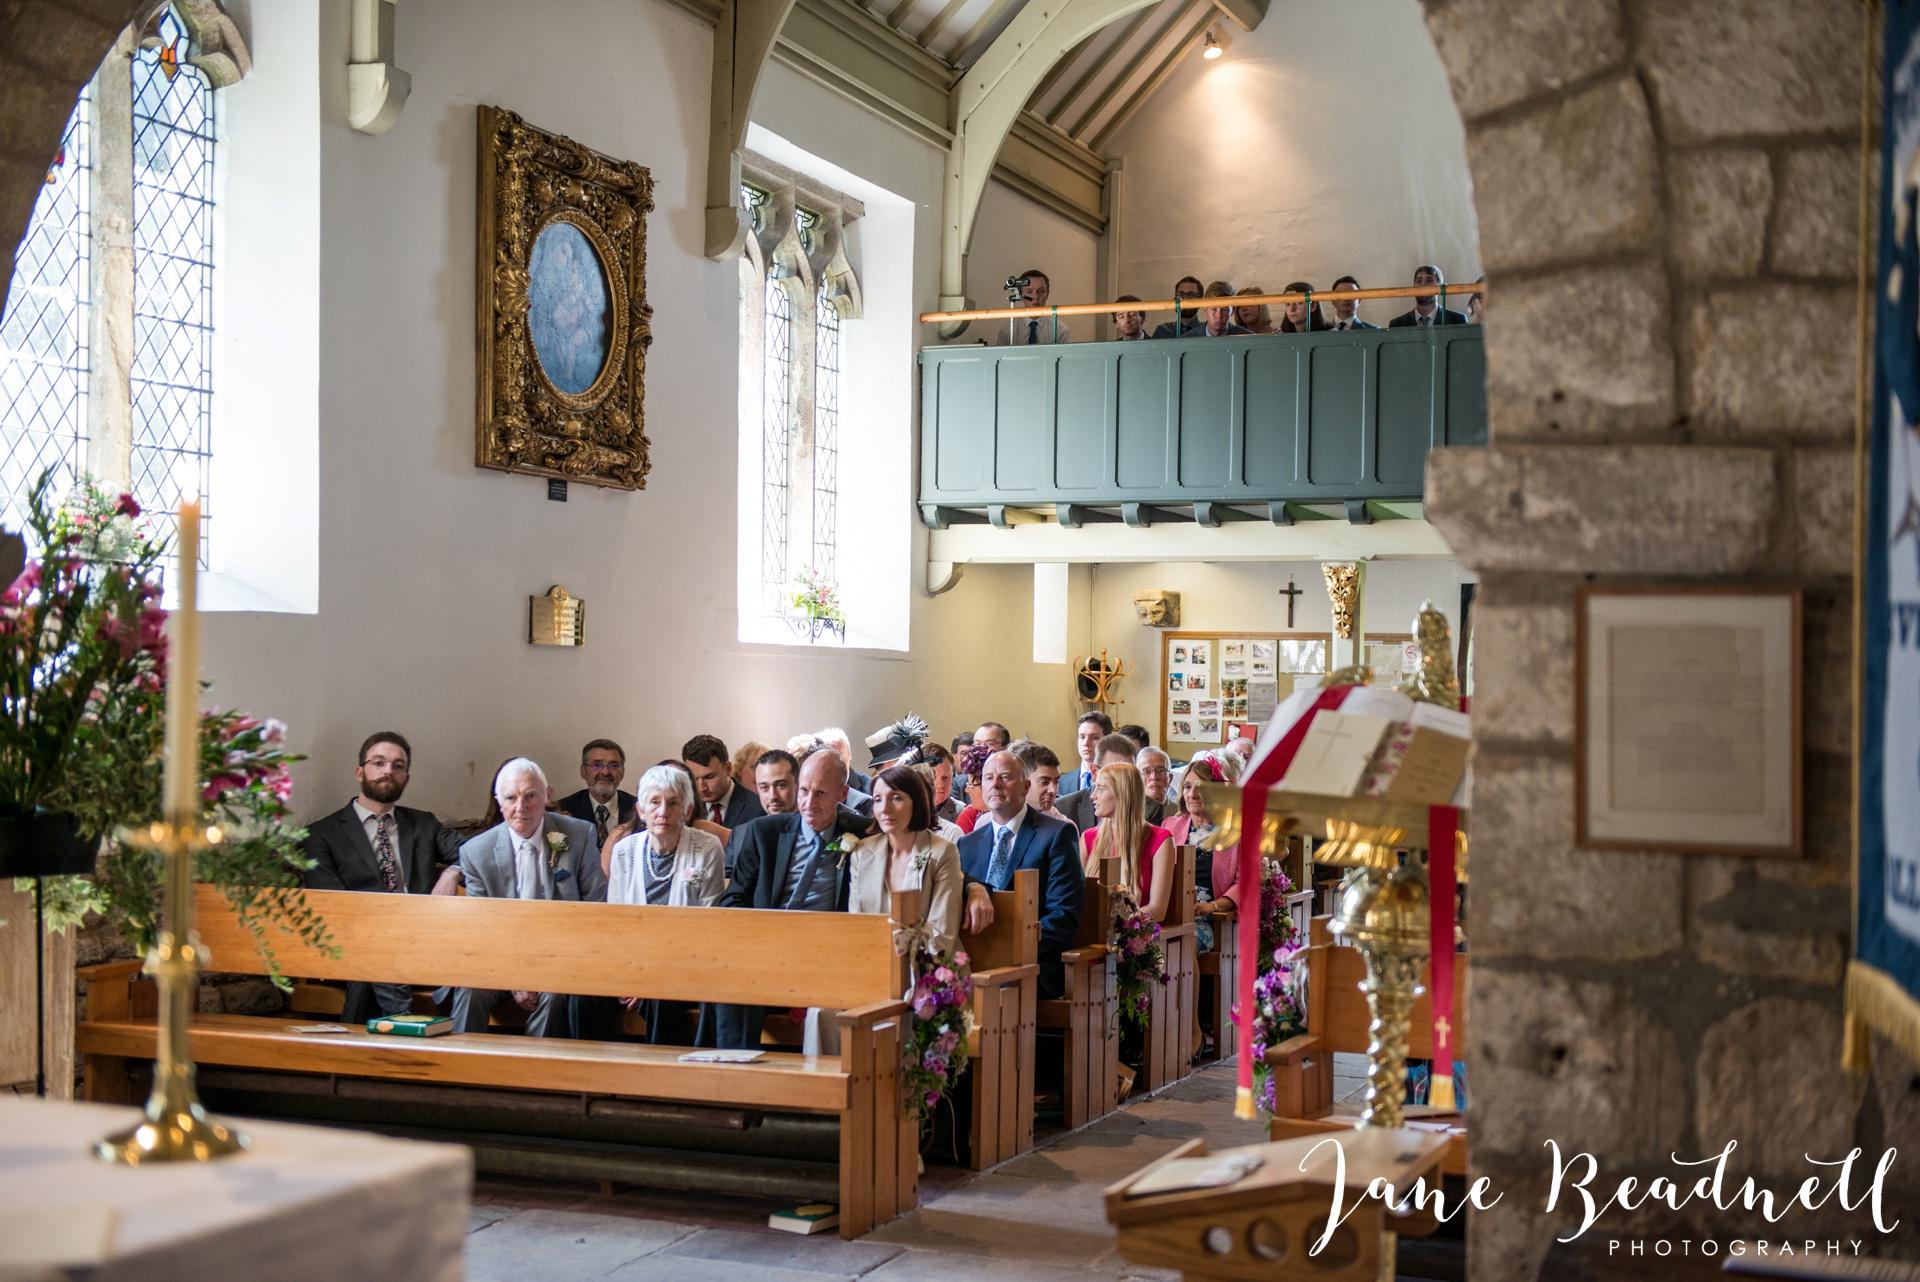 yorkshire-fine-art-wedding-photographer-jane-beadnell-photography-poppleton-york_0054